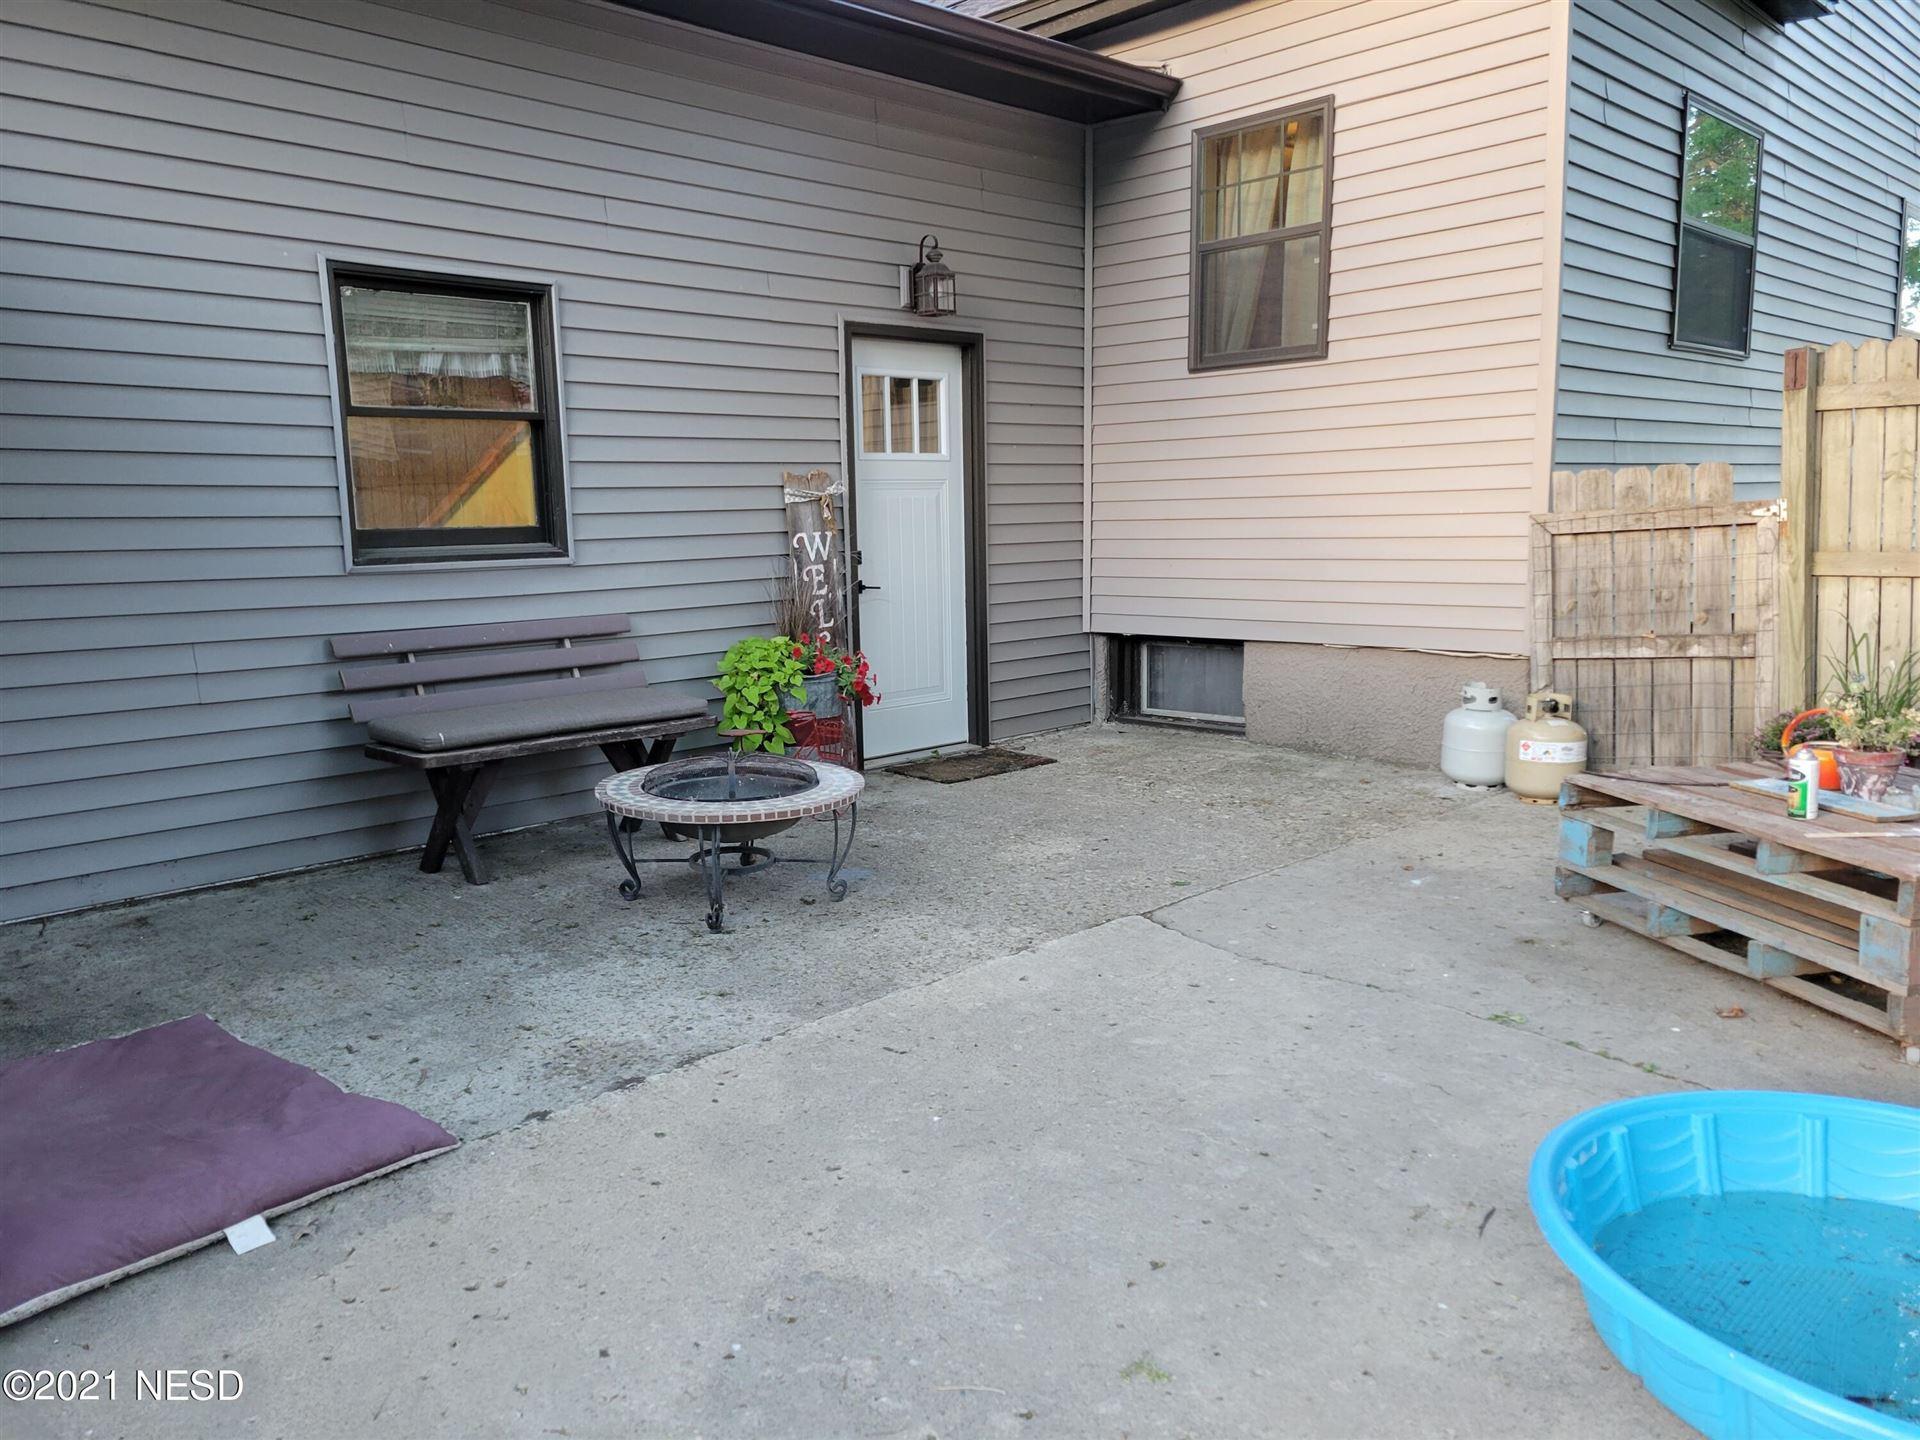 Photo of 603 S MAPLE STREET, Watertown, SD 57201 (MLS # 33-1704)